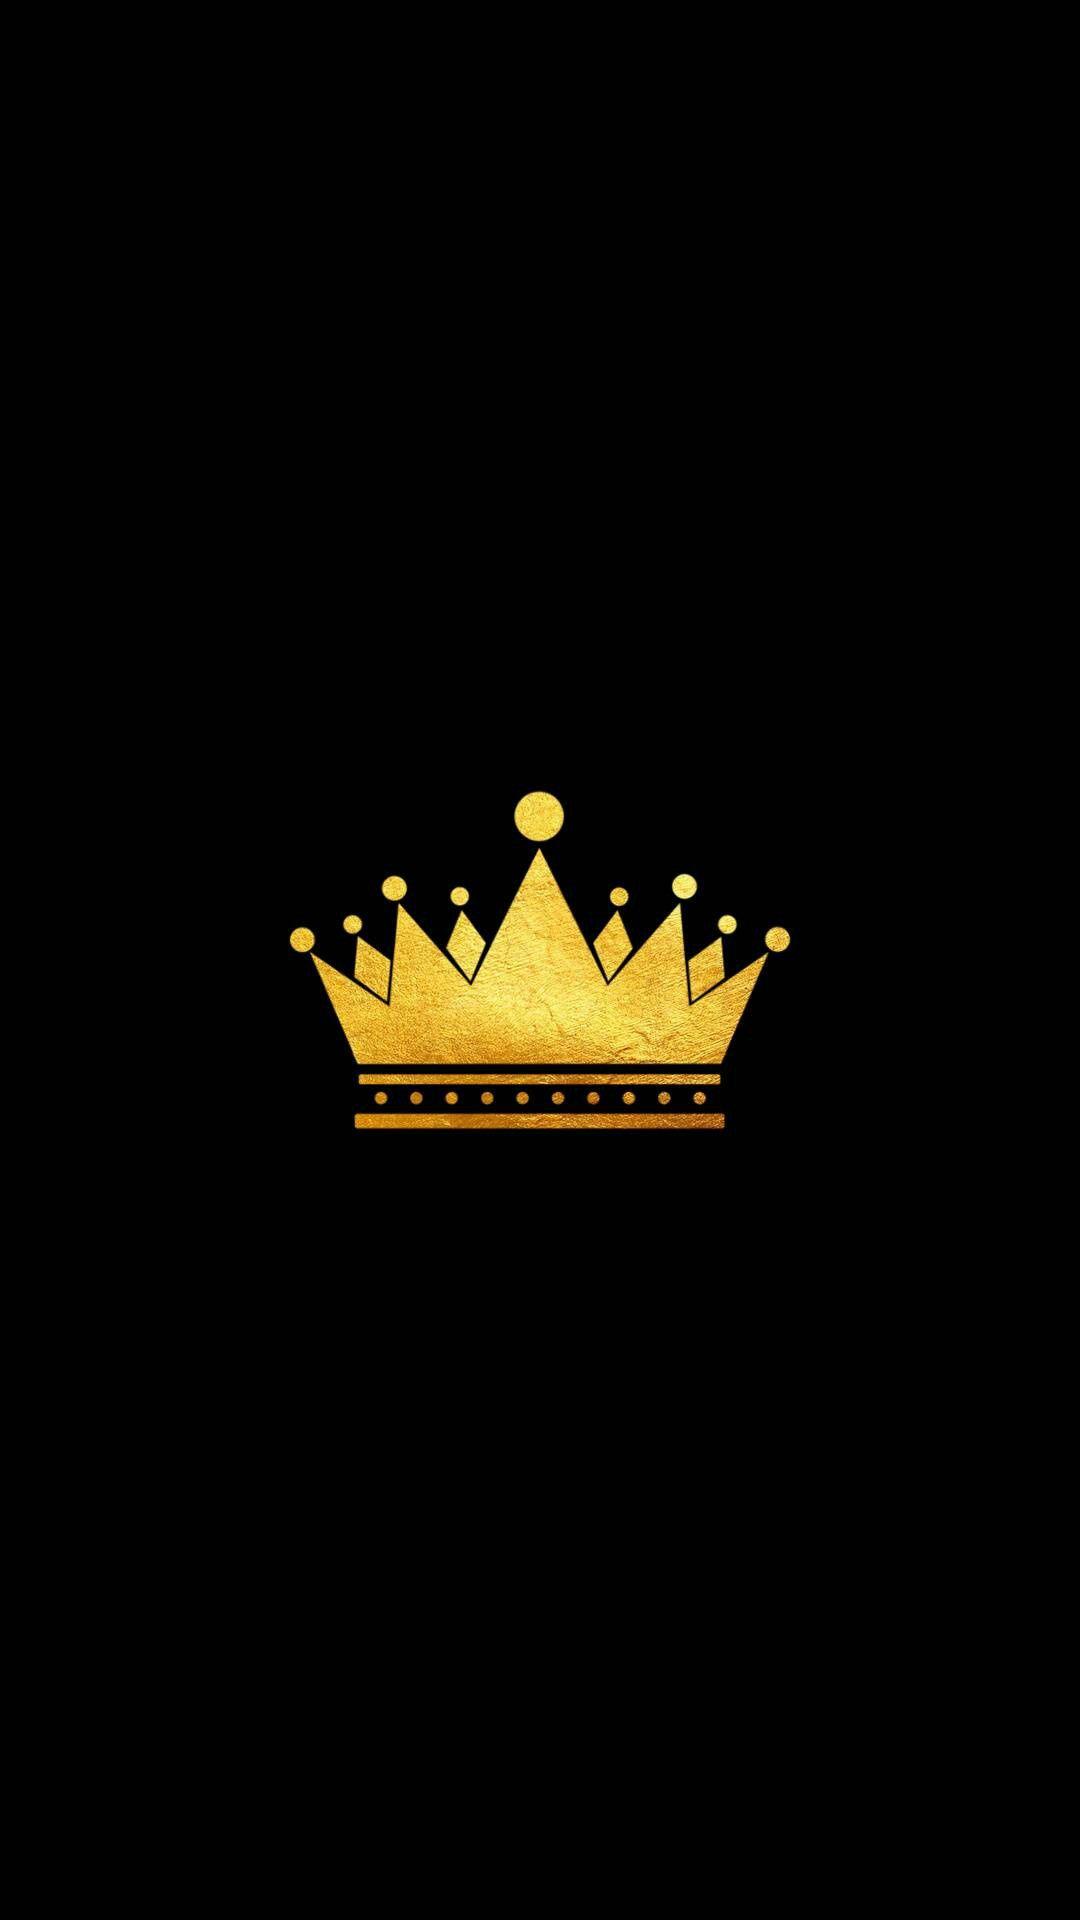 Pin de Pritamsingh Pritamsingh en p en 2020 | Fondos de coronas, Fondos de  pantalla de iphone, Skate fondos de pantalla